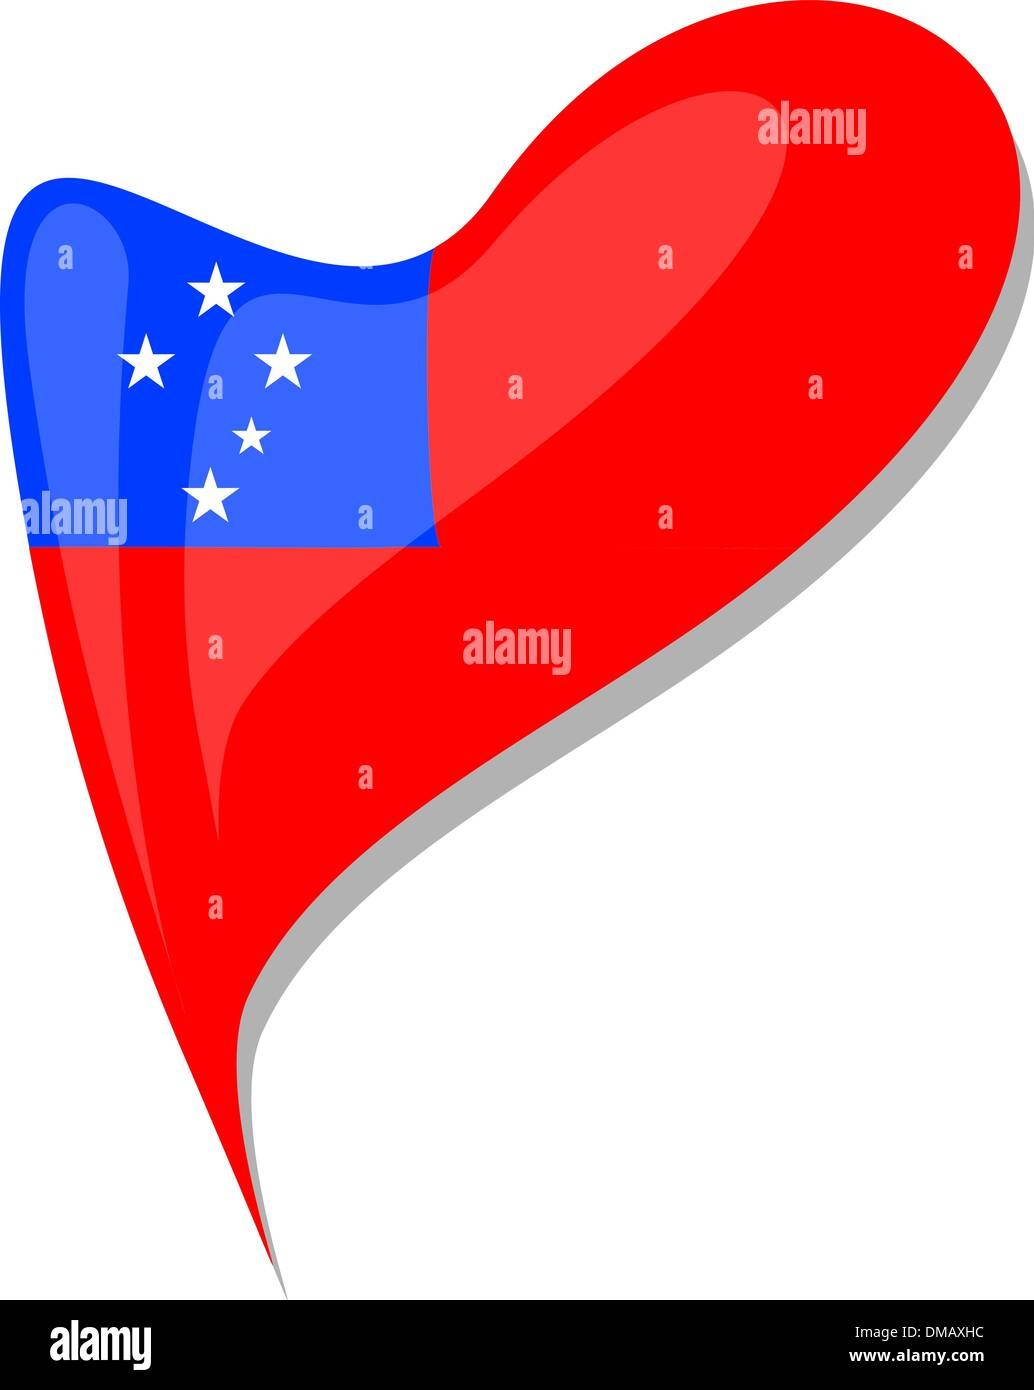 samoa flag button heart shape. vector Stock Vector